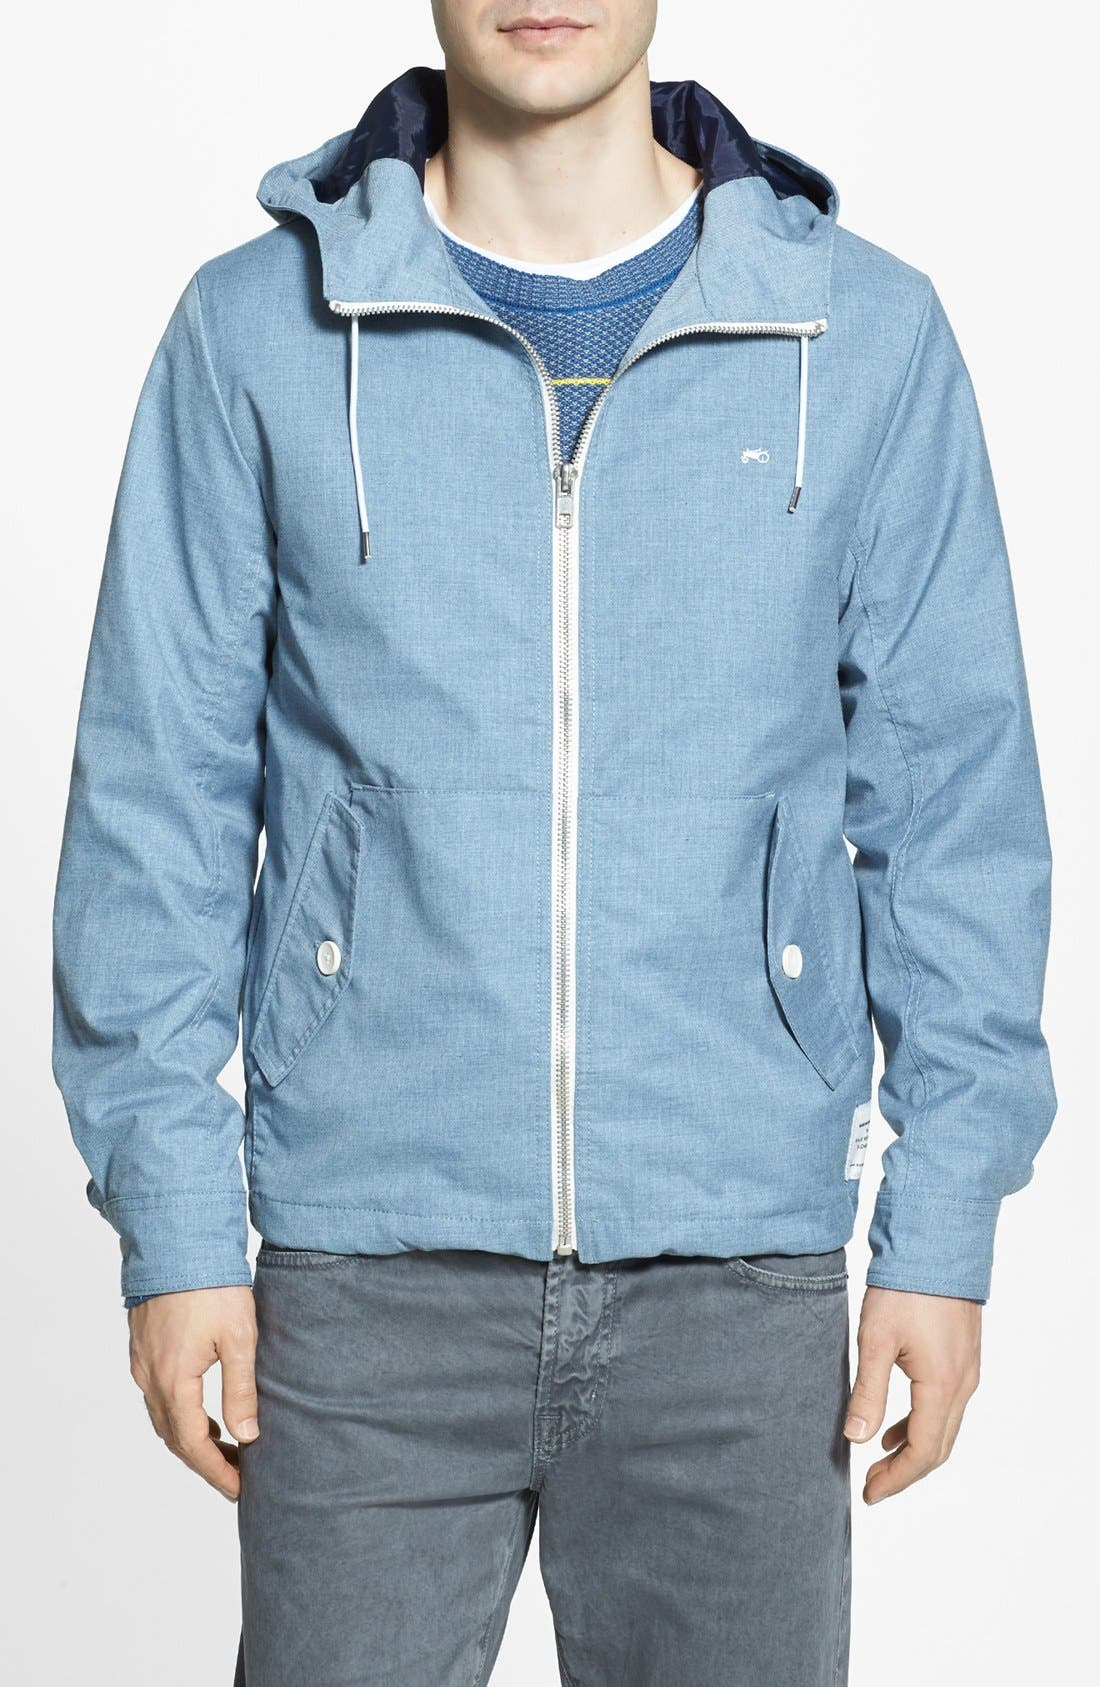 Alternate Image 1 Selected - Moods of Norway 'Jon Andre' Cotton Zip Jacket